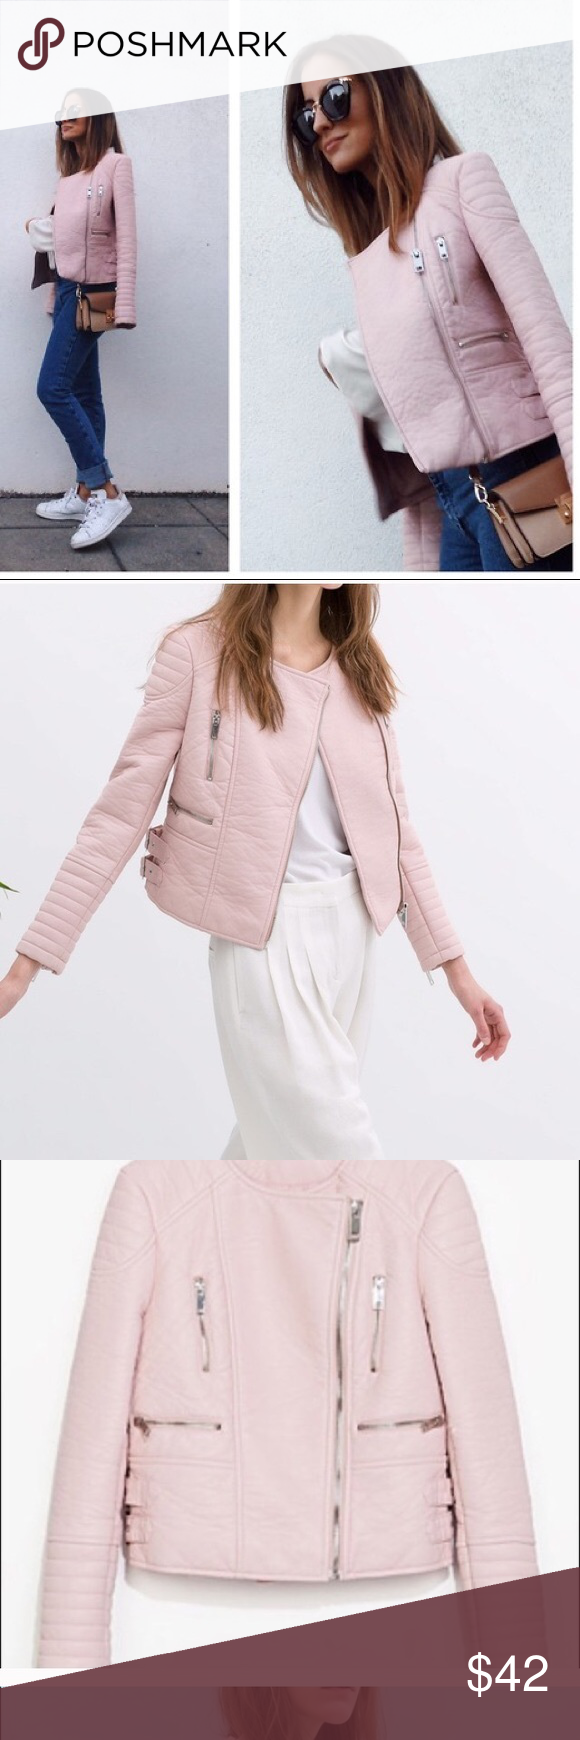 Zara Pink Leather Jacket Light pink faux leather jacket by